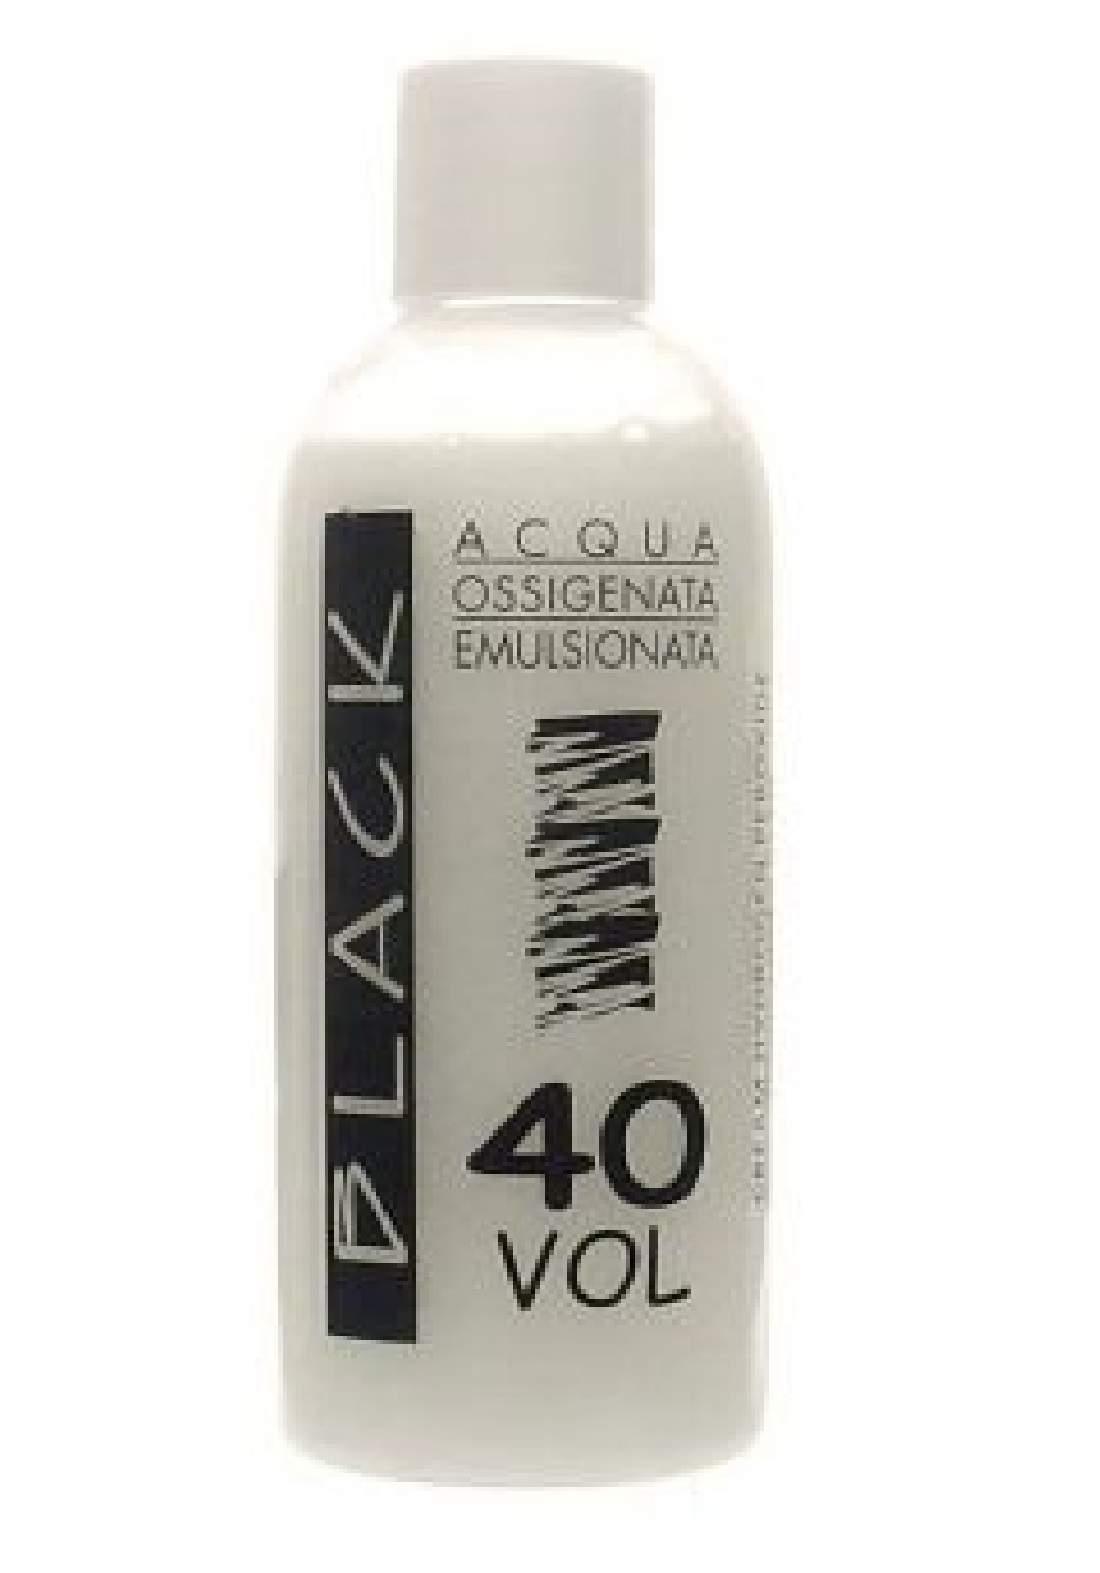 Black Professional Creamy 12% Hydrogen Peroxide 250ml - Oxidizing Cream 40vol كريم مؤكسد للصبغة